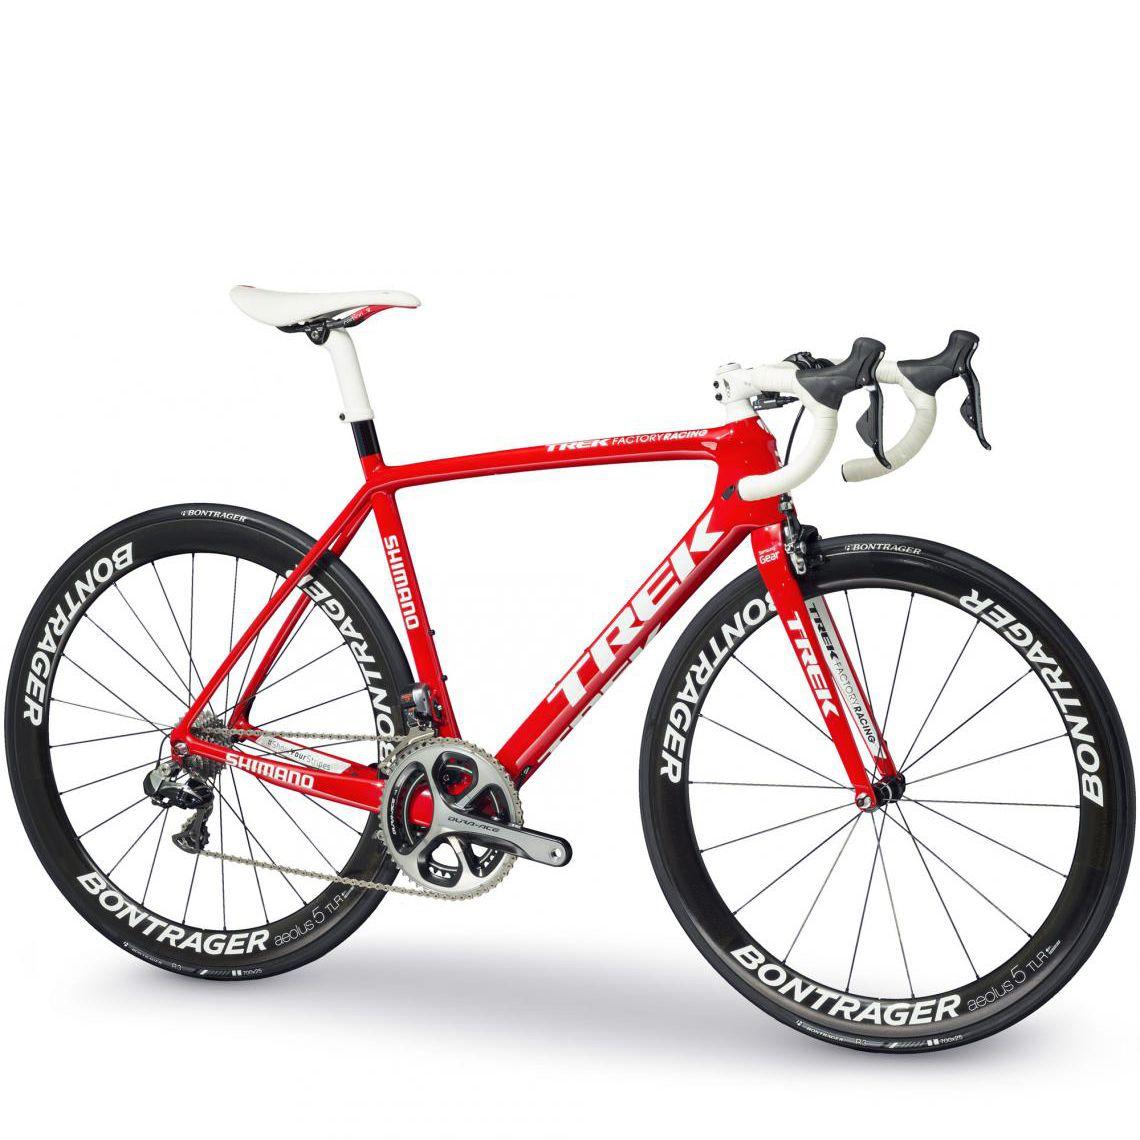 Trek Factory Racing 2015 Road Bike Cycling Trek Madone Trek